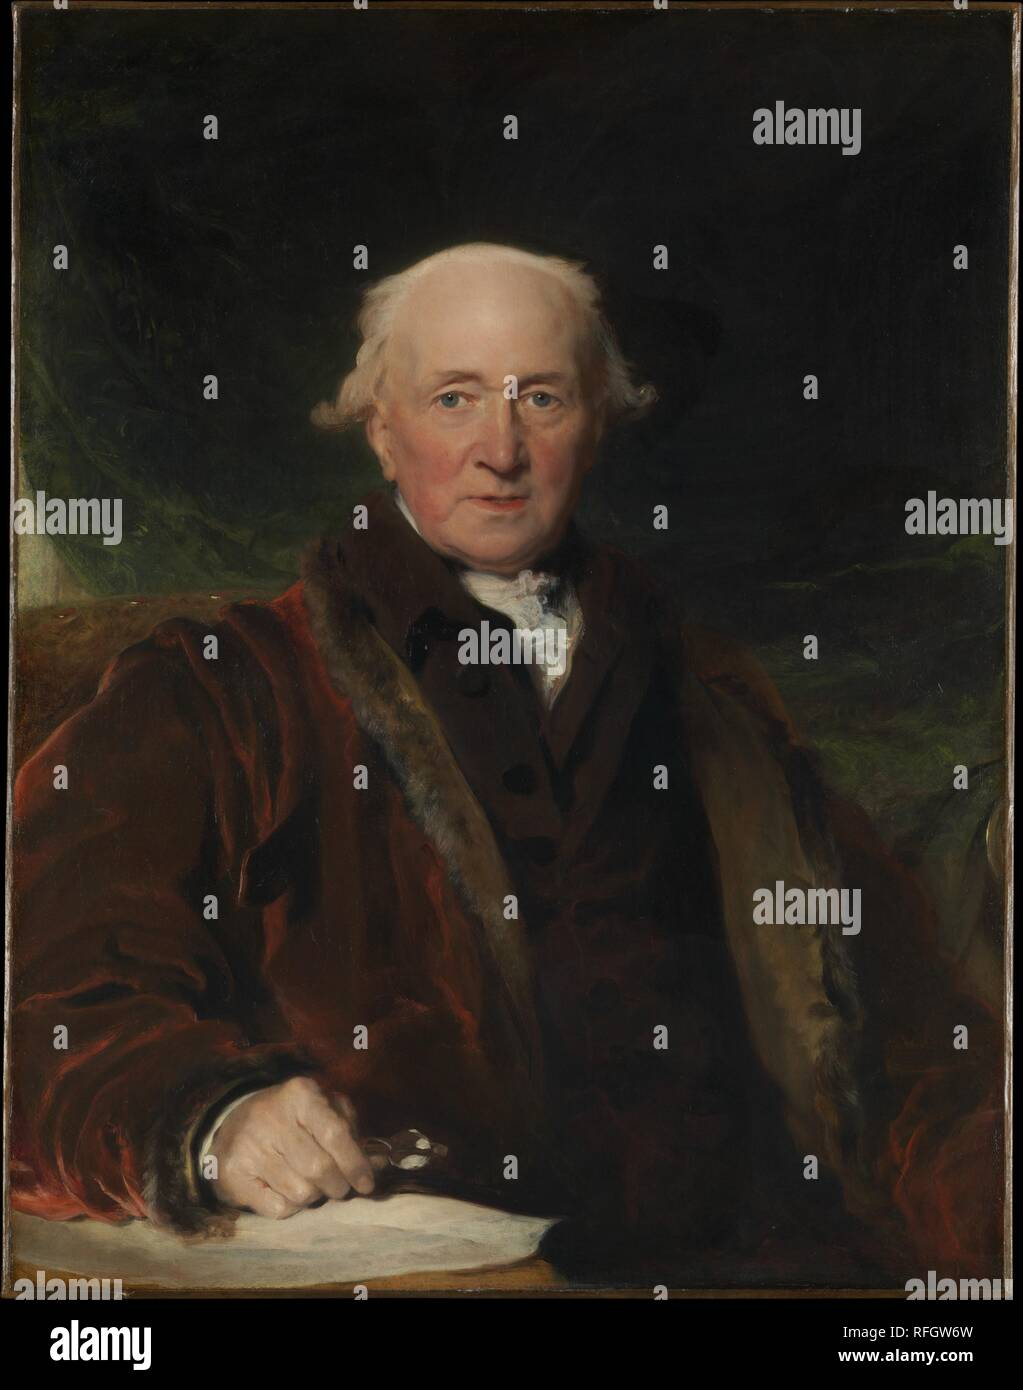 "Sir Thomas Lawrence (British, Bristol 1769â€""1830 Londra) John Julius Angerstein (1736â€""1823), olio su tela, 36 x 28. (91,4 x 71,1 cm) il Metropolitan Museum of Art di New York, il lascito di Adele L. Lehman, in memoria di Arthur Lehman, 1965 (65.181.9) http://www.metmuseum.org/Collections/search-the-collections/436852 Immagini Stock"